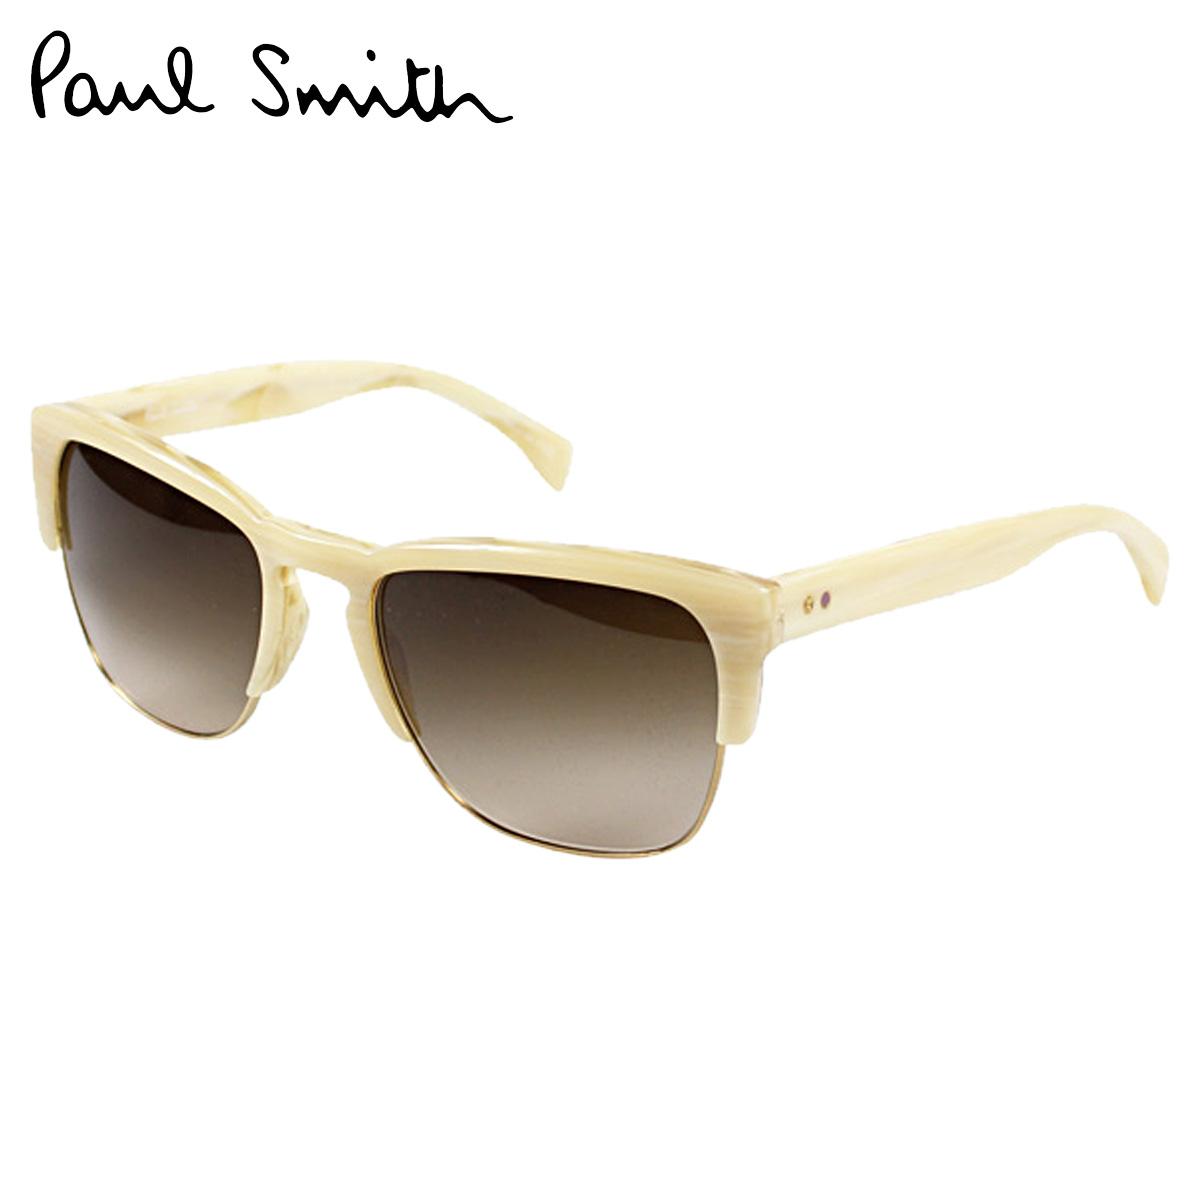 Rim Paul Smith Glasses Sunglasses 8 Womens Beige Half Unisex5 New Stockregular Mens 4jc3LA5Rq